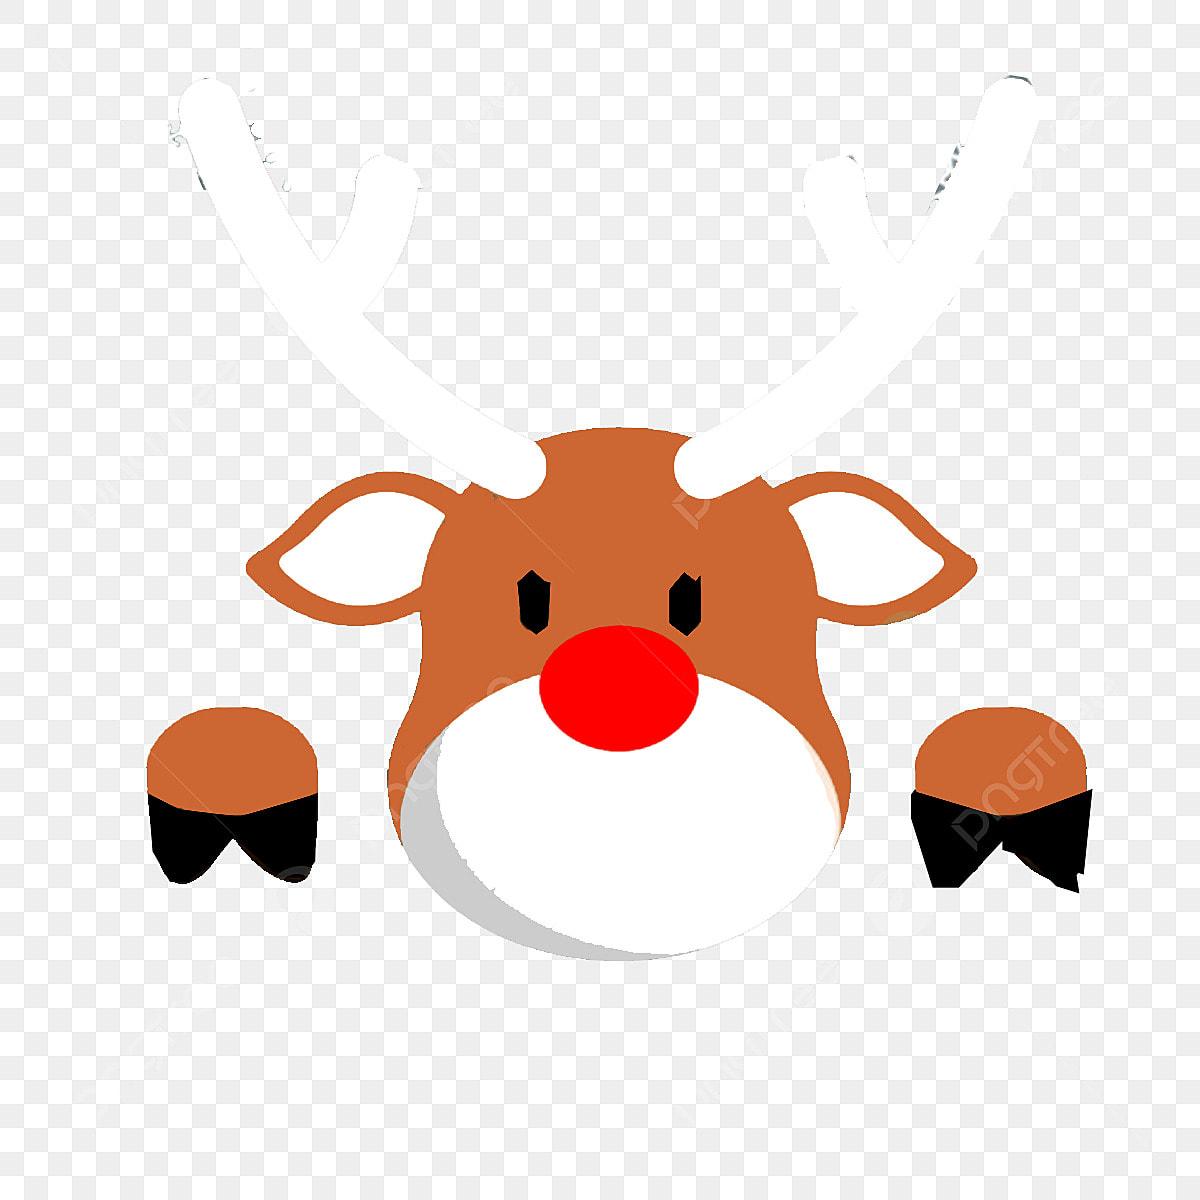 Christmas Reindeer Png.Christmas Reindeer Png Material Free Download 2018